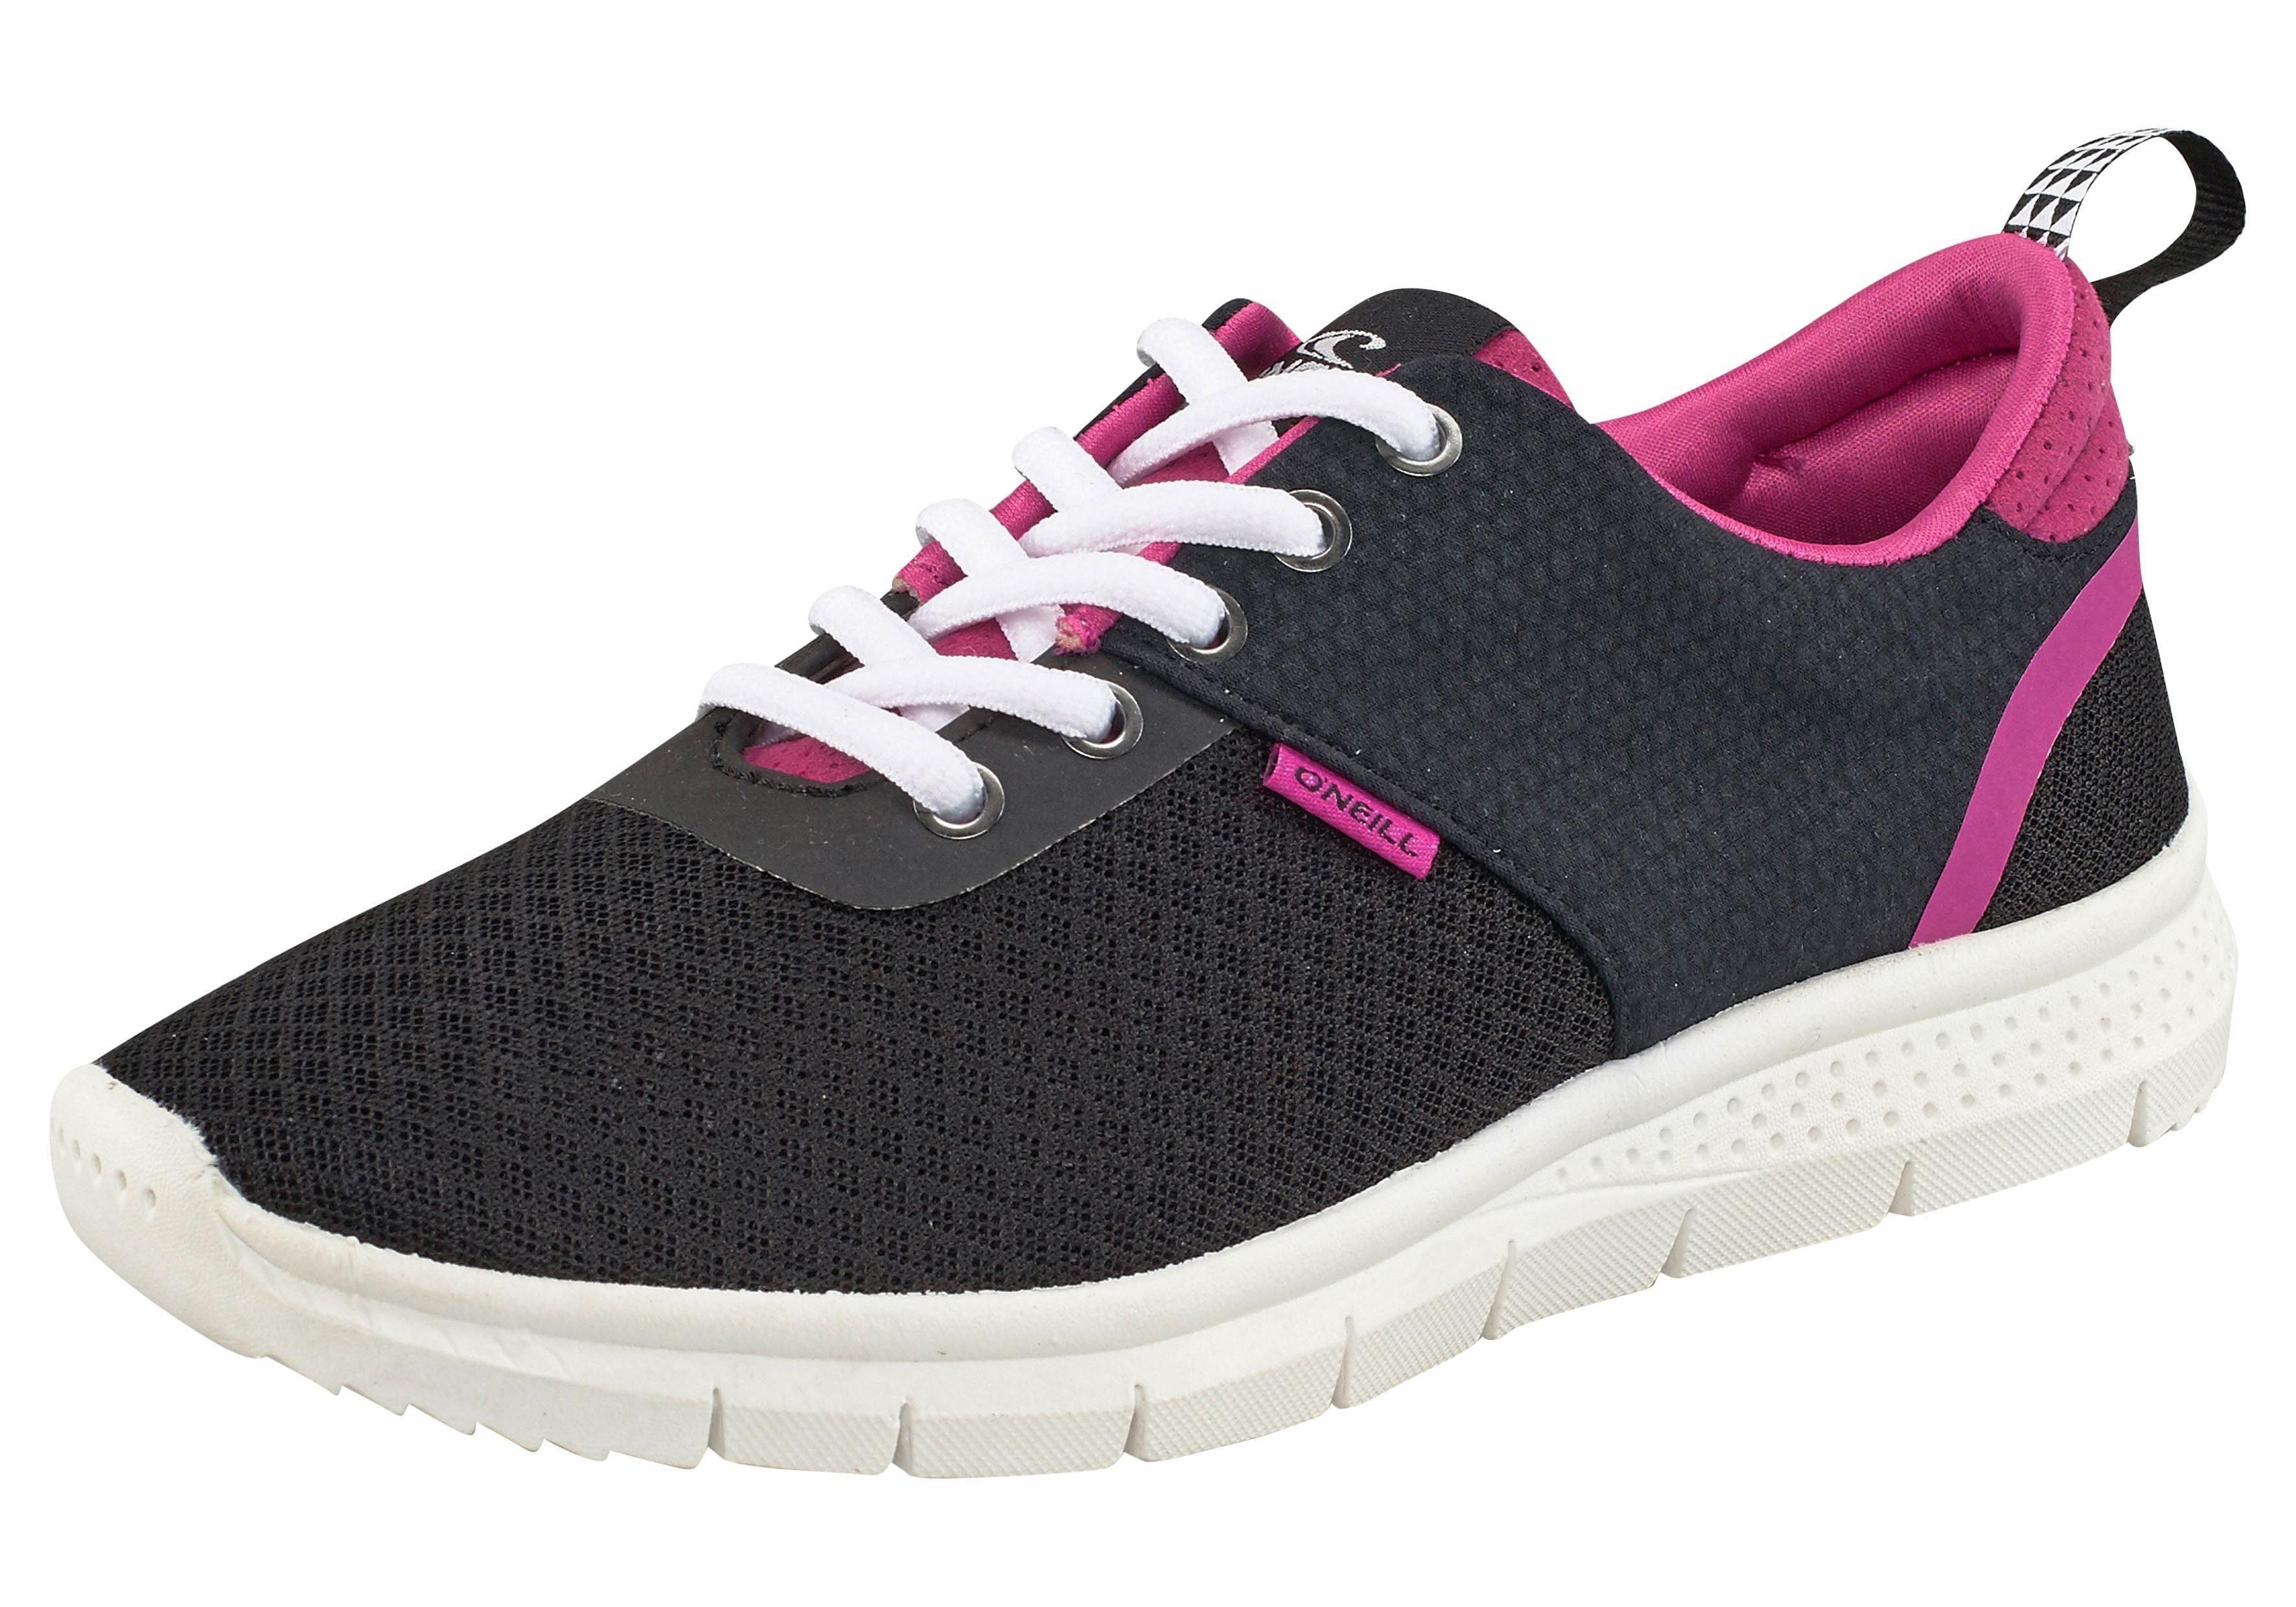 O'Neill Commuter LT W Sneaker online kaufen  schwarz-pink